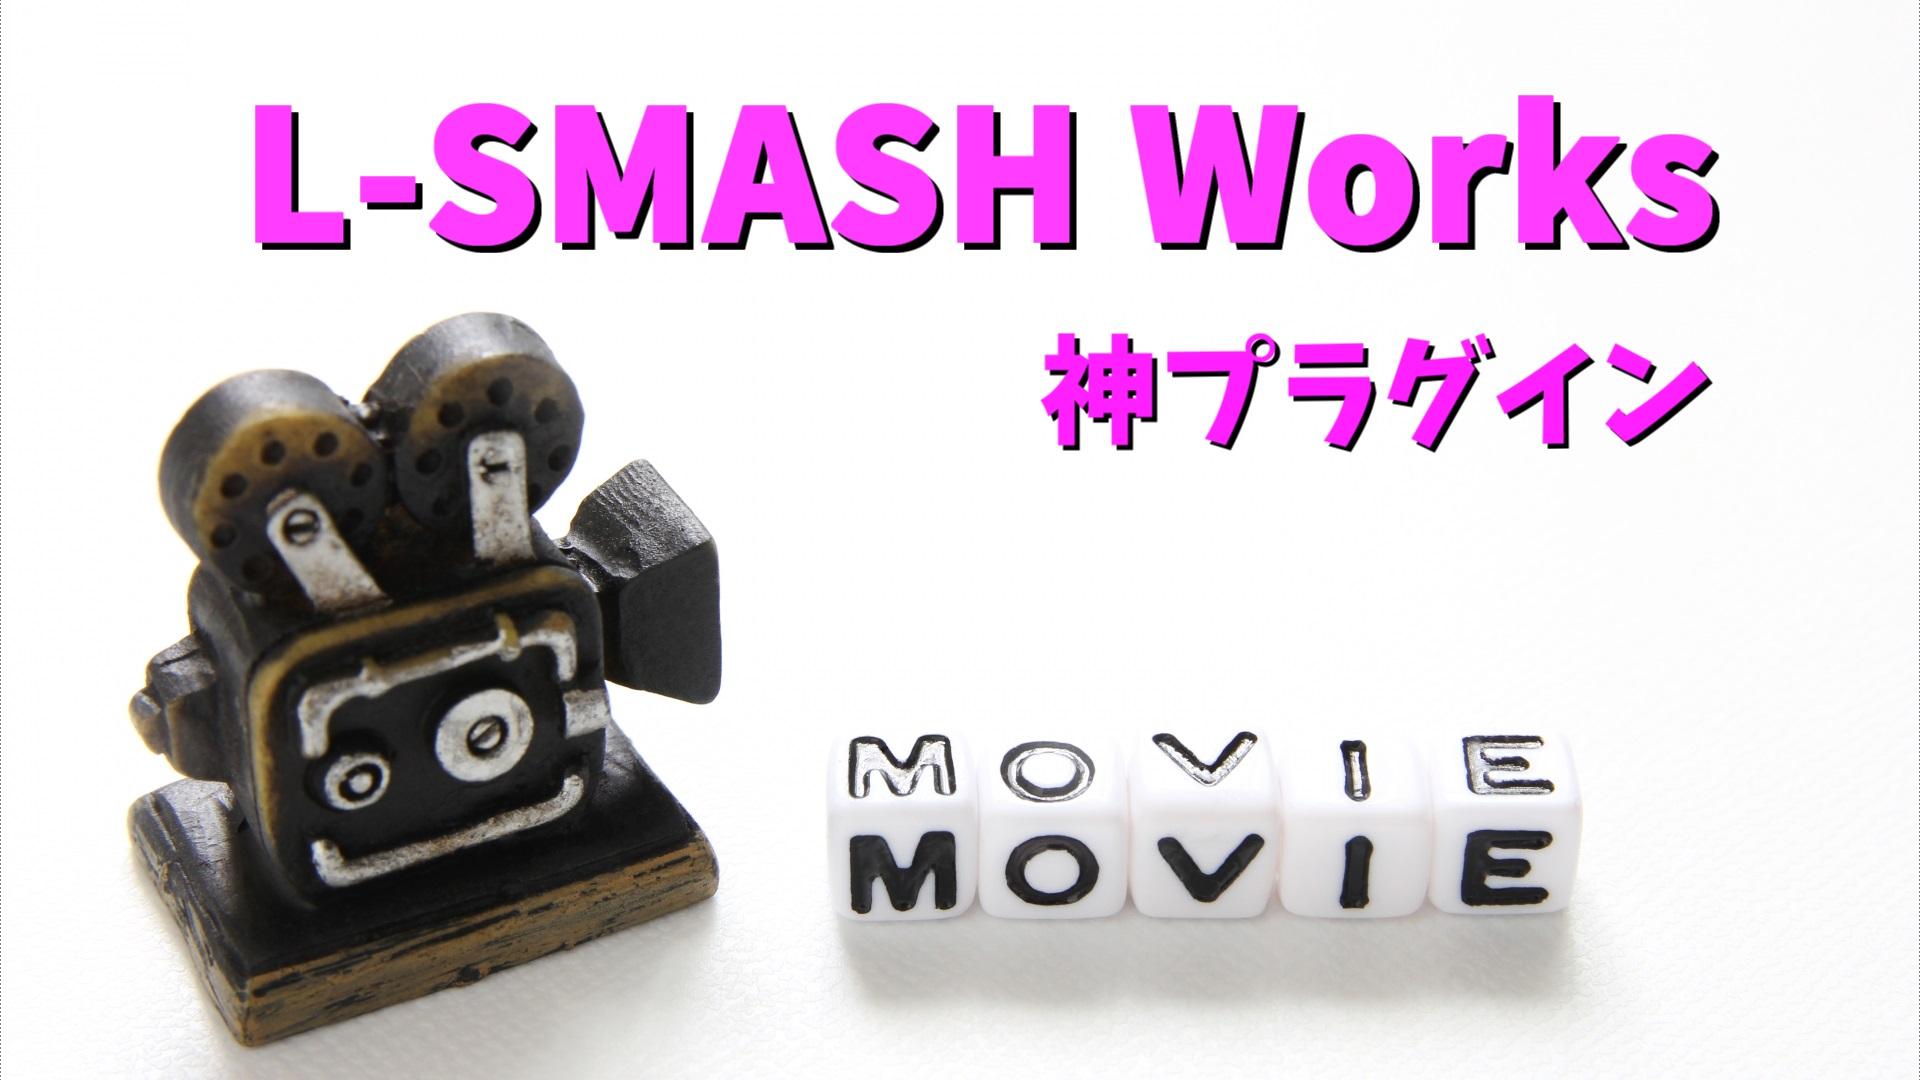 L-SMASH Worksは神プラグイン